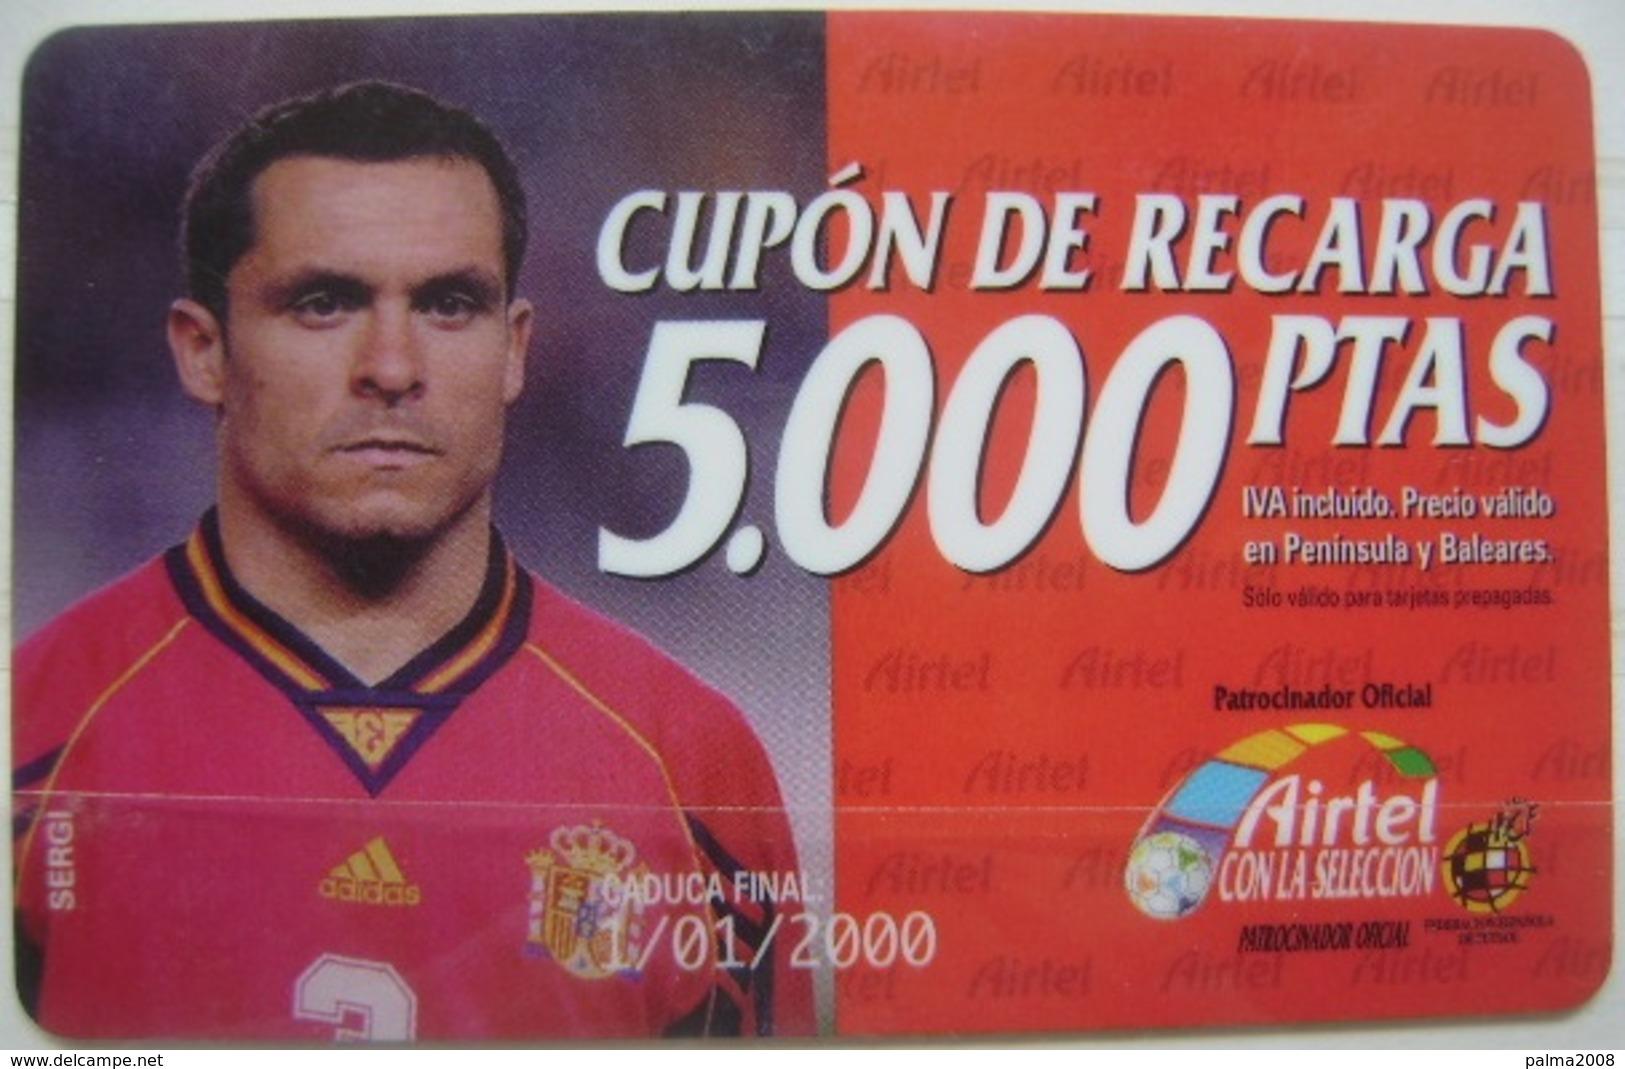 AIRTEL - CUPON DE 5000 PTS - USADA 1ª CALIDAD LA DE LA FOTO - A698 - Spanien